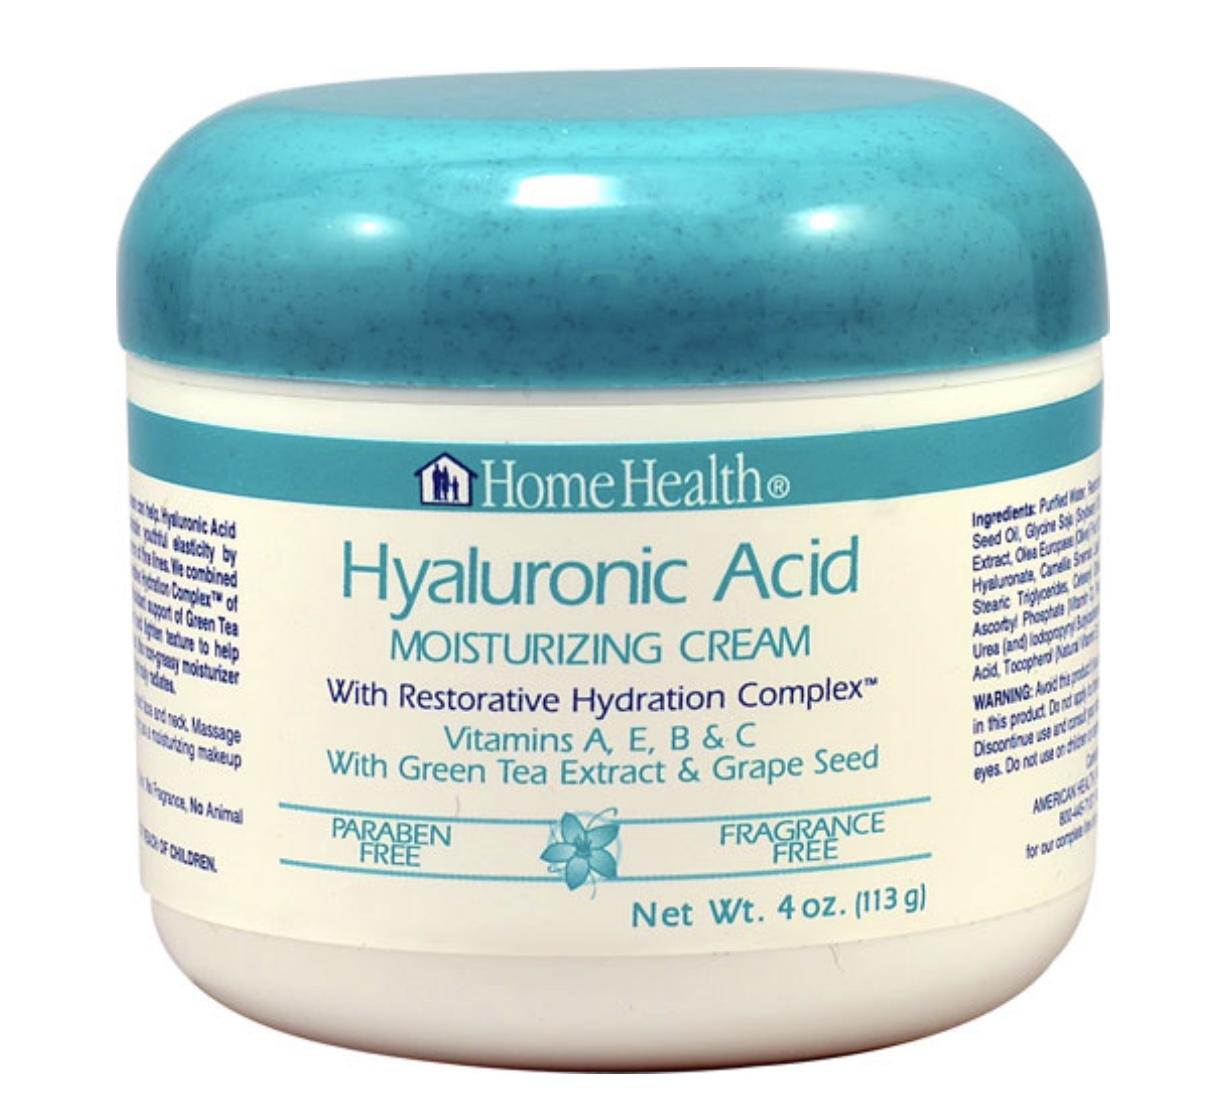 Home Health Hyaluronic Acid Moisturizing Cream